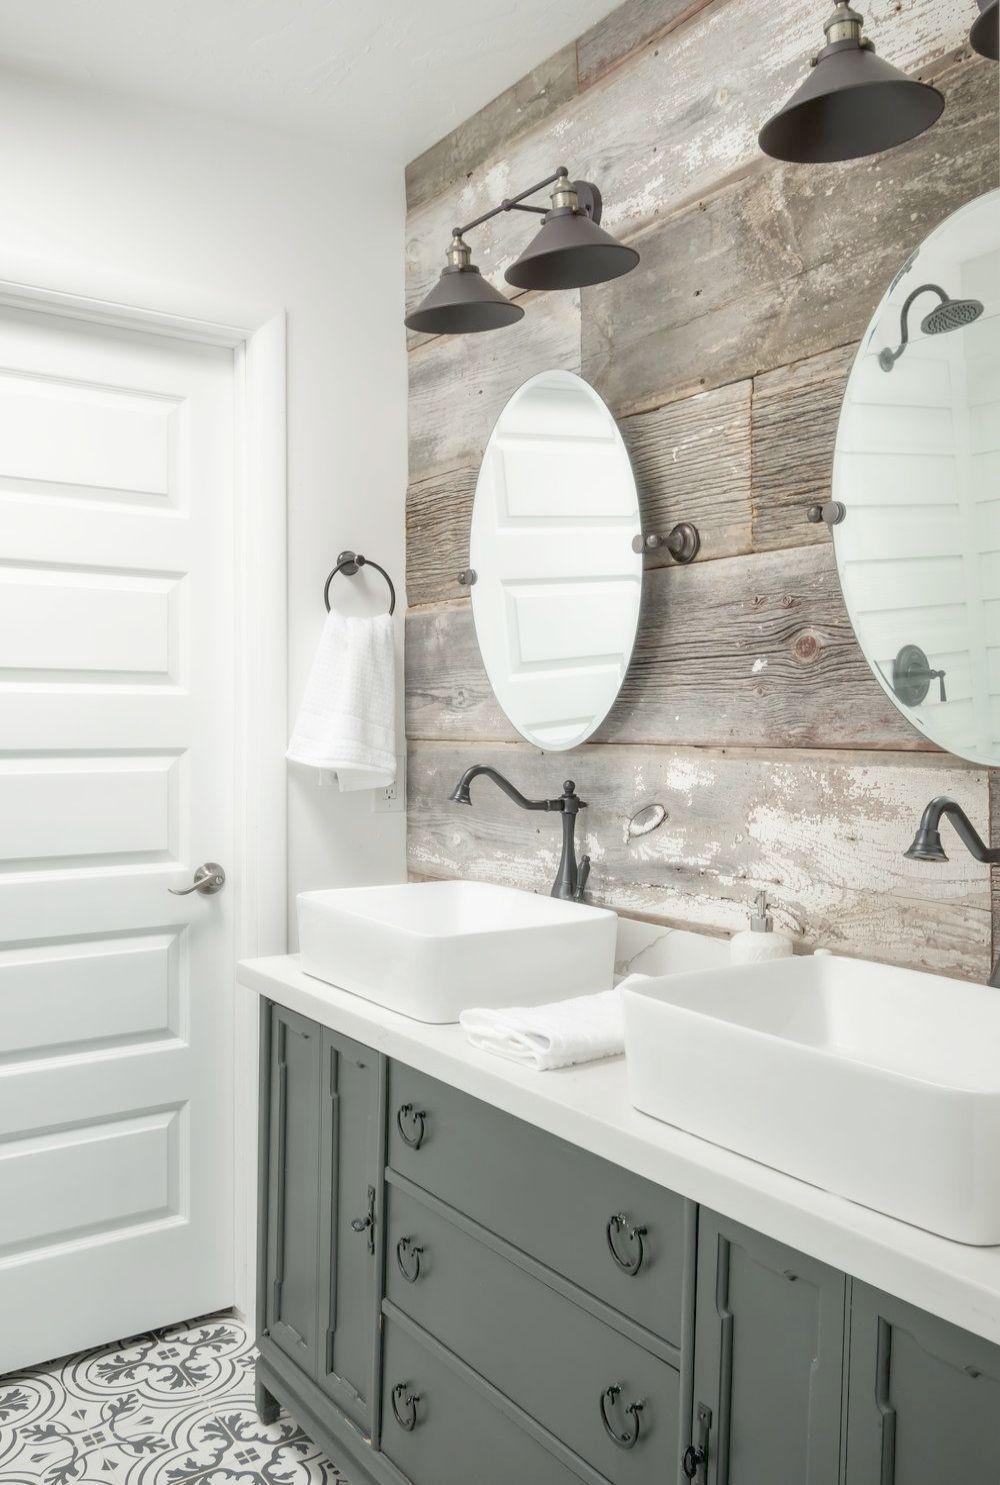 Bathroom Ideas For Apartment The Bathroom Remodel Timeline